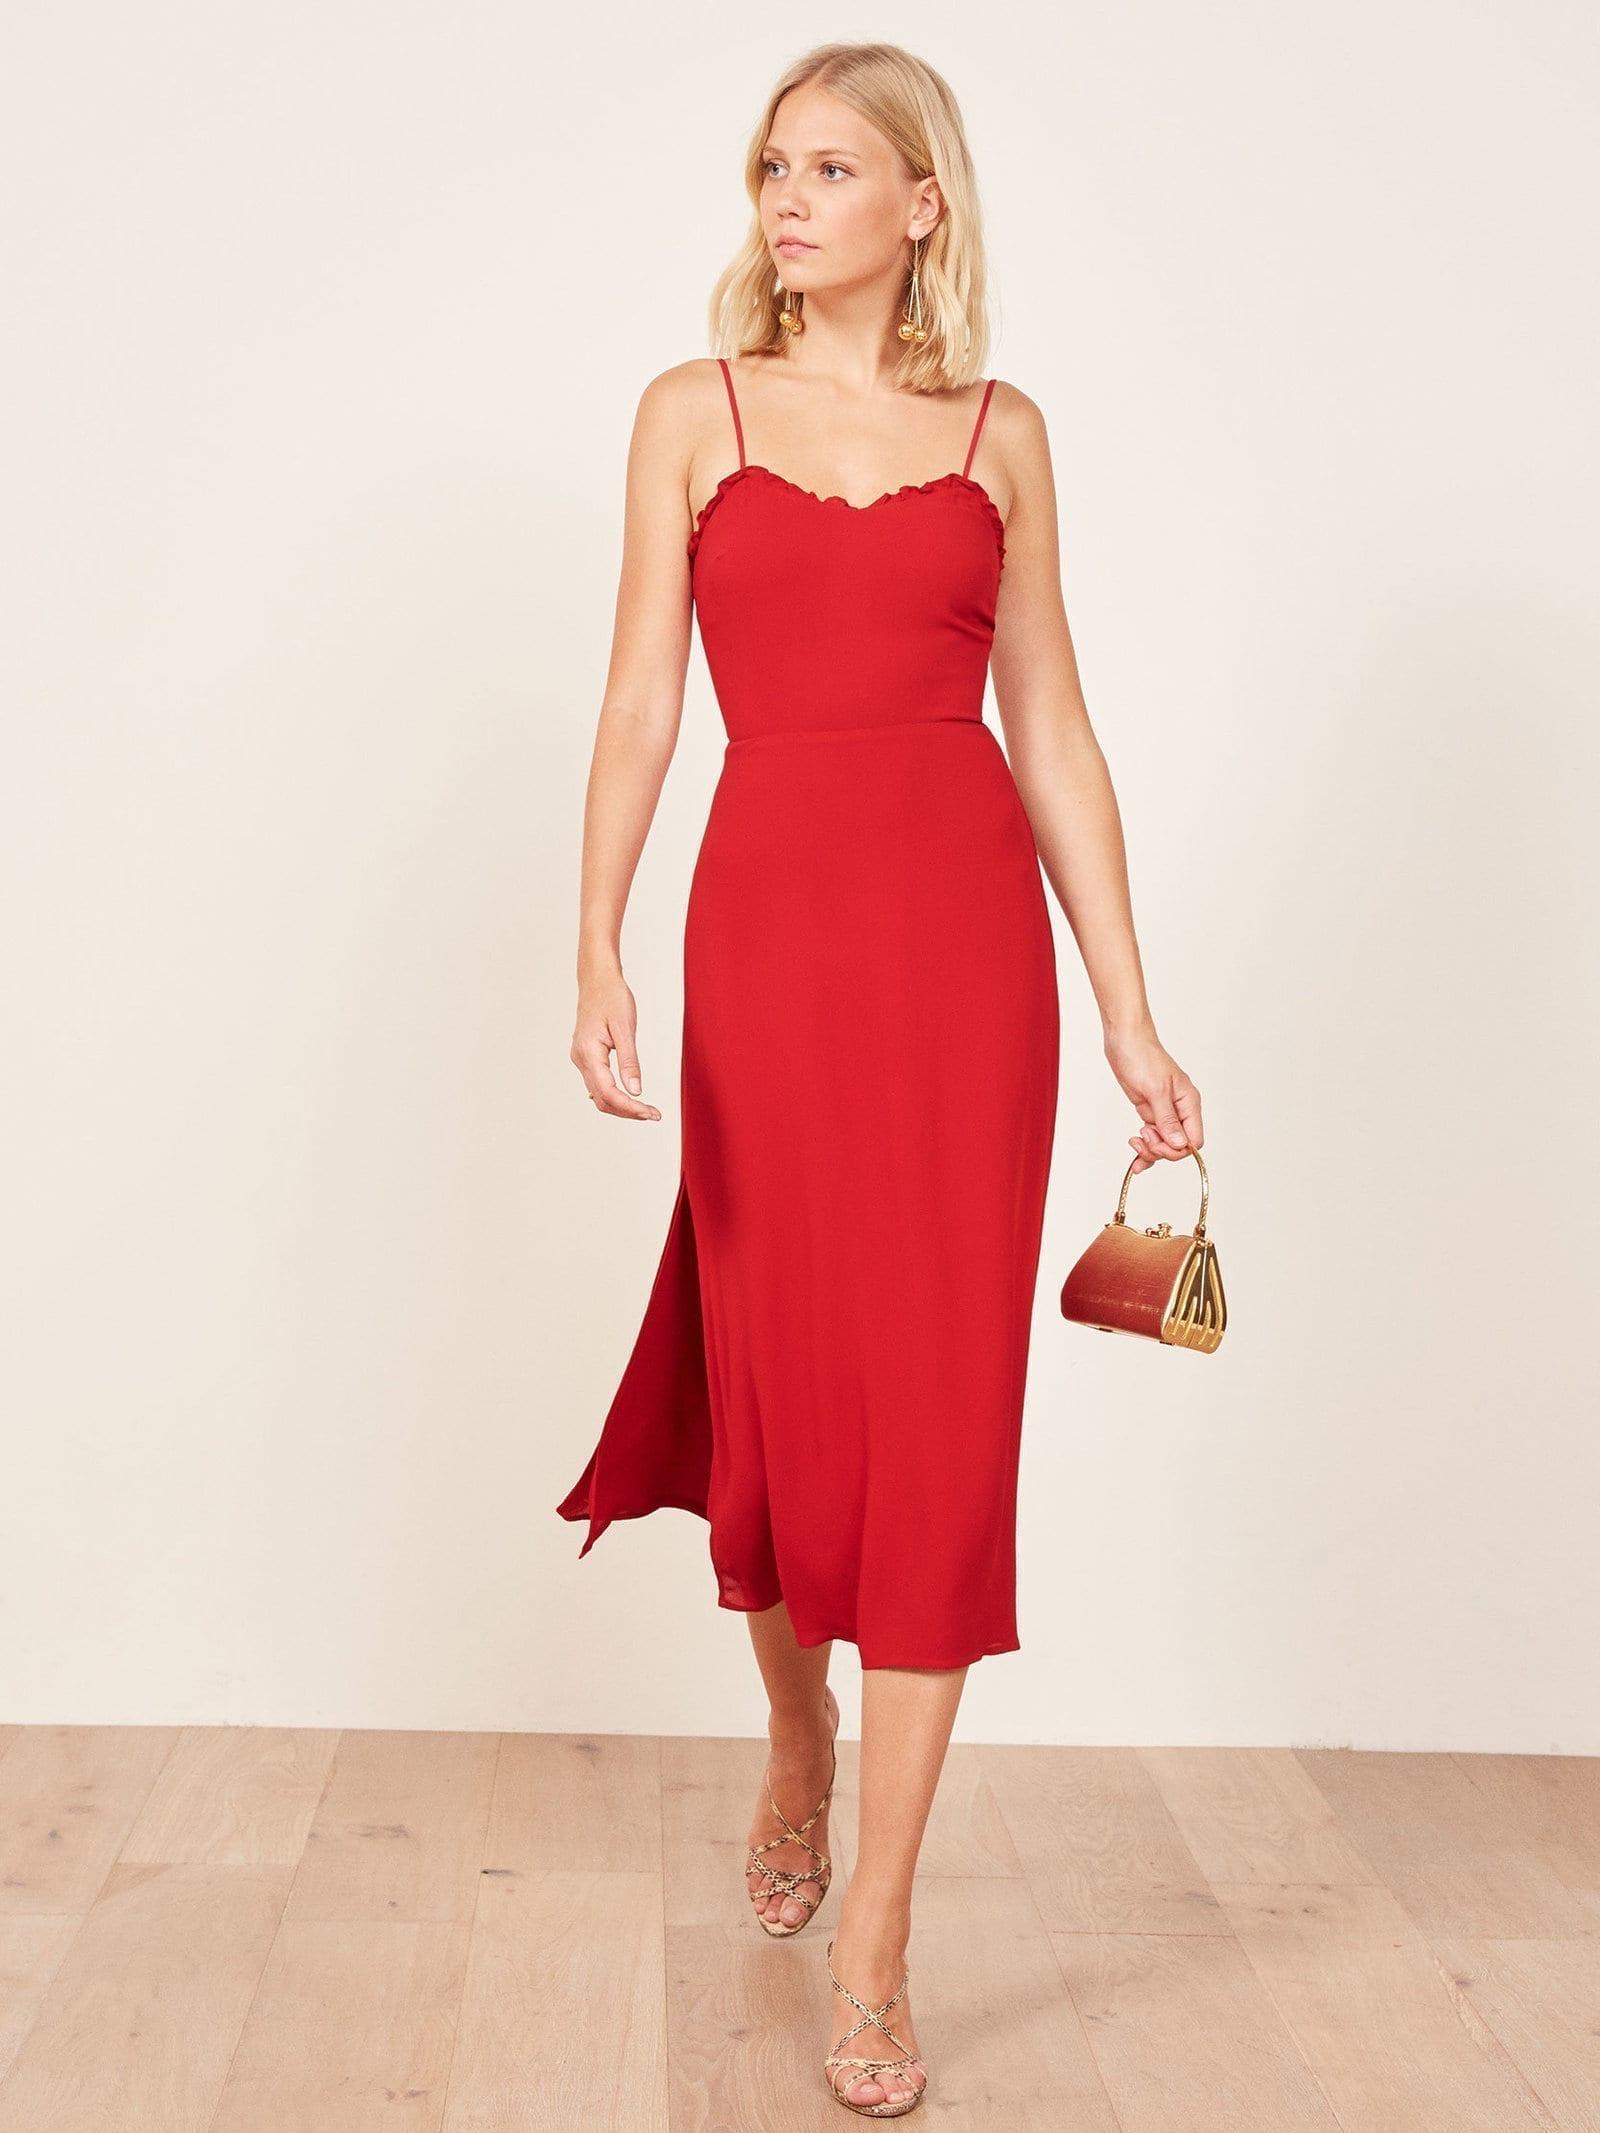 REFORMATION Cassandra Cherry Dress